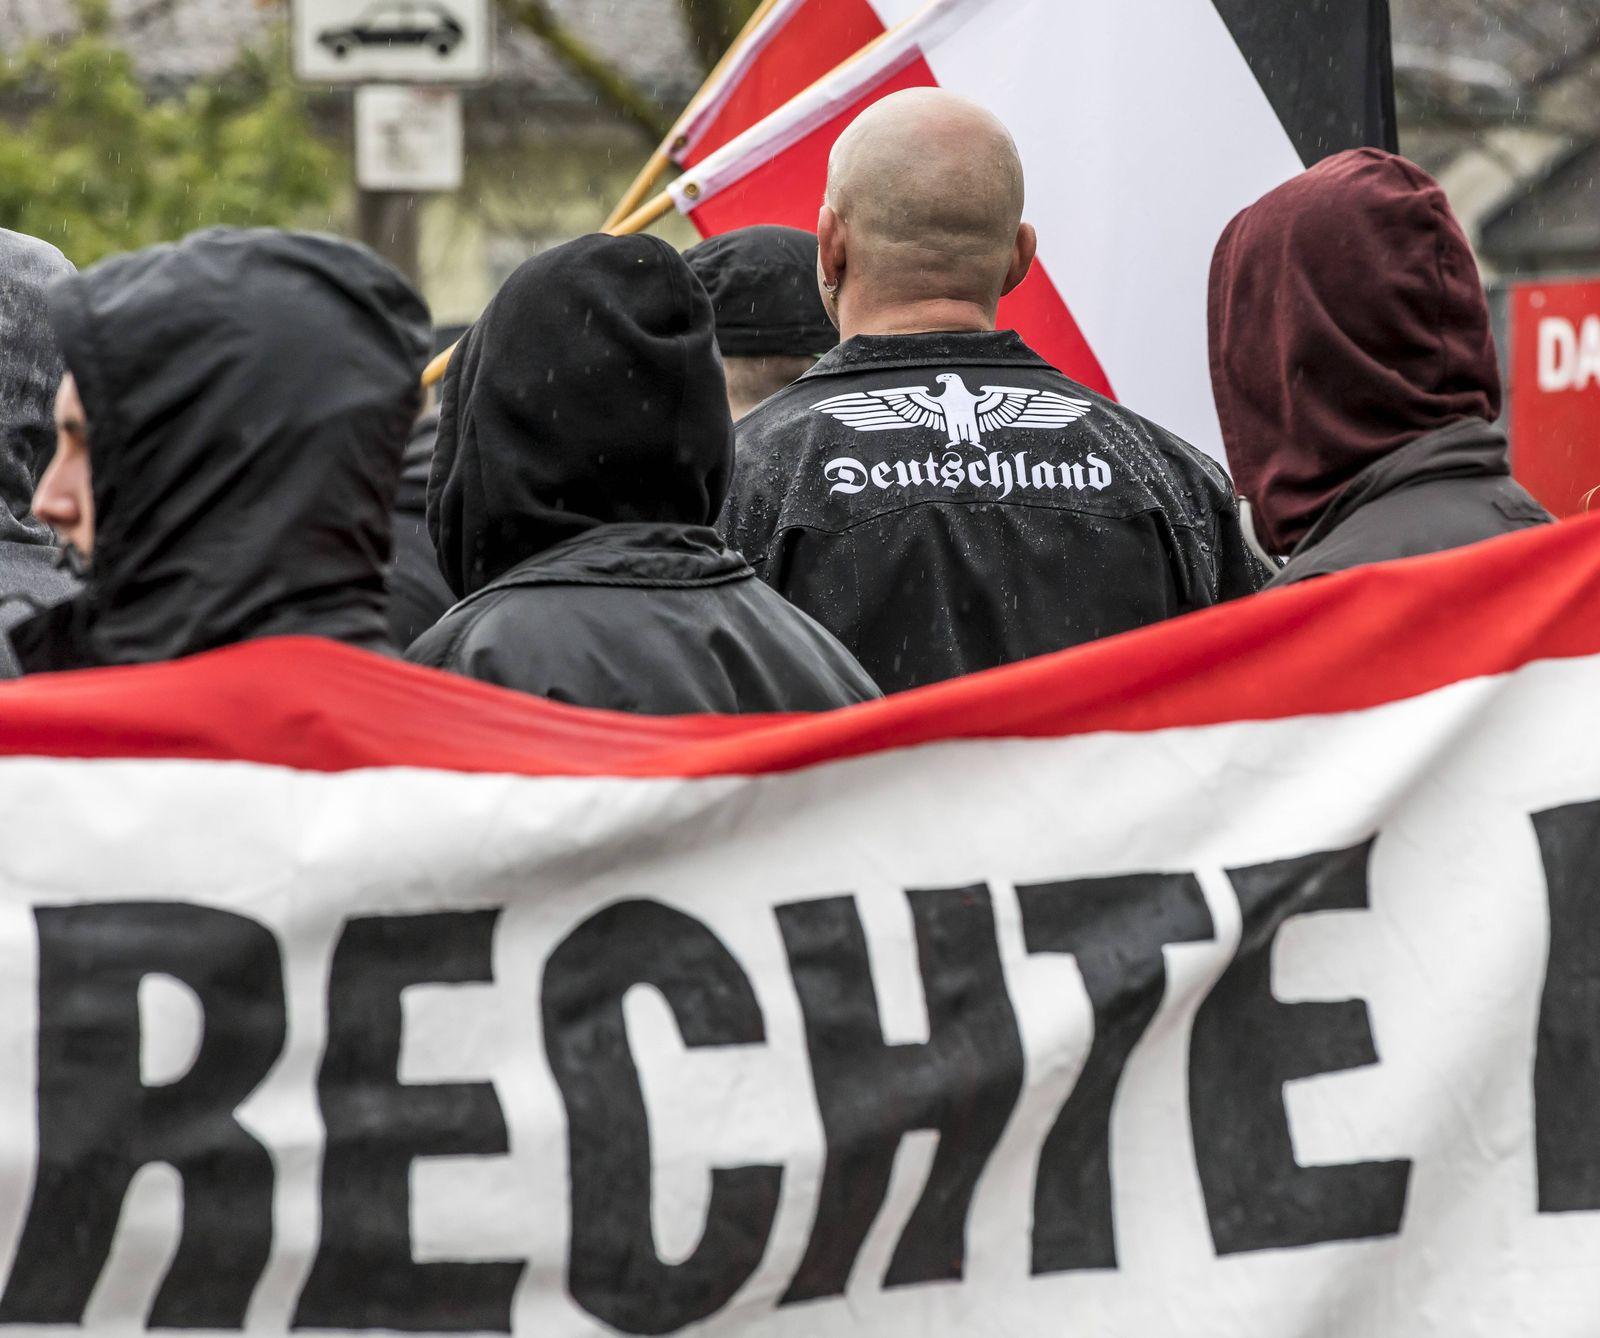 EINMALIGE VERWENDUNG Neonazis/ Demonstration/ Rechtsterrorismus